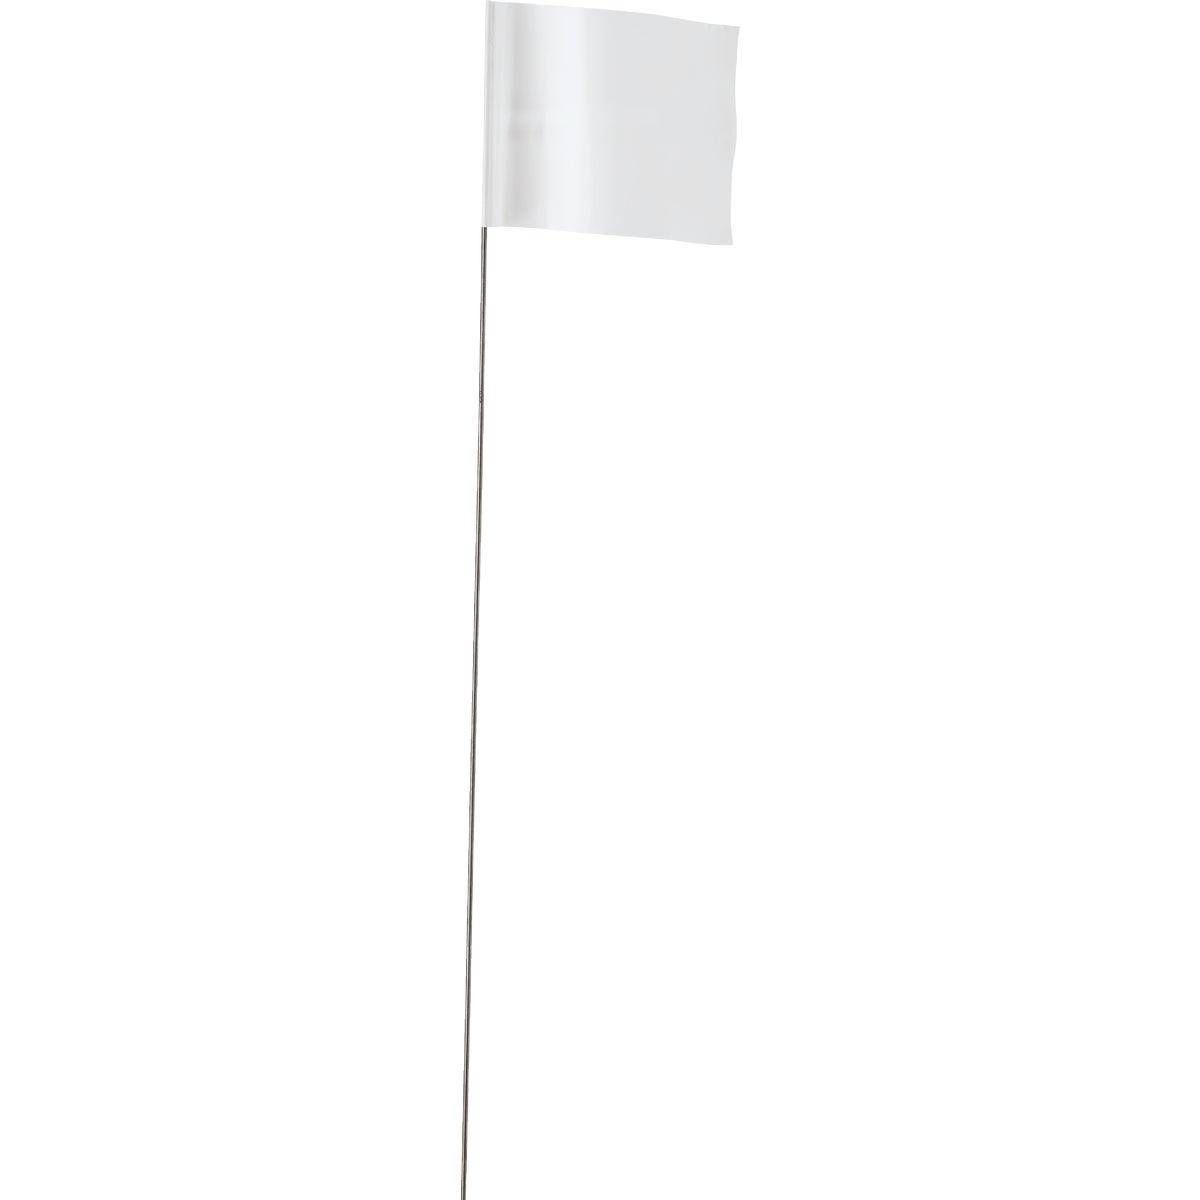 Irwin 100PK WHITE FLAGS 2034204